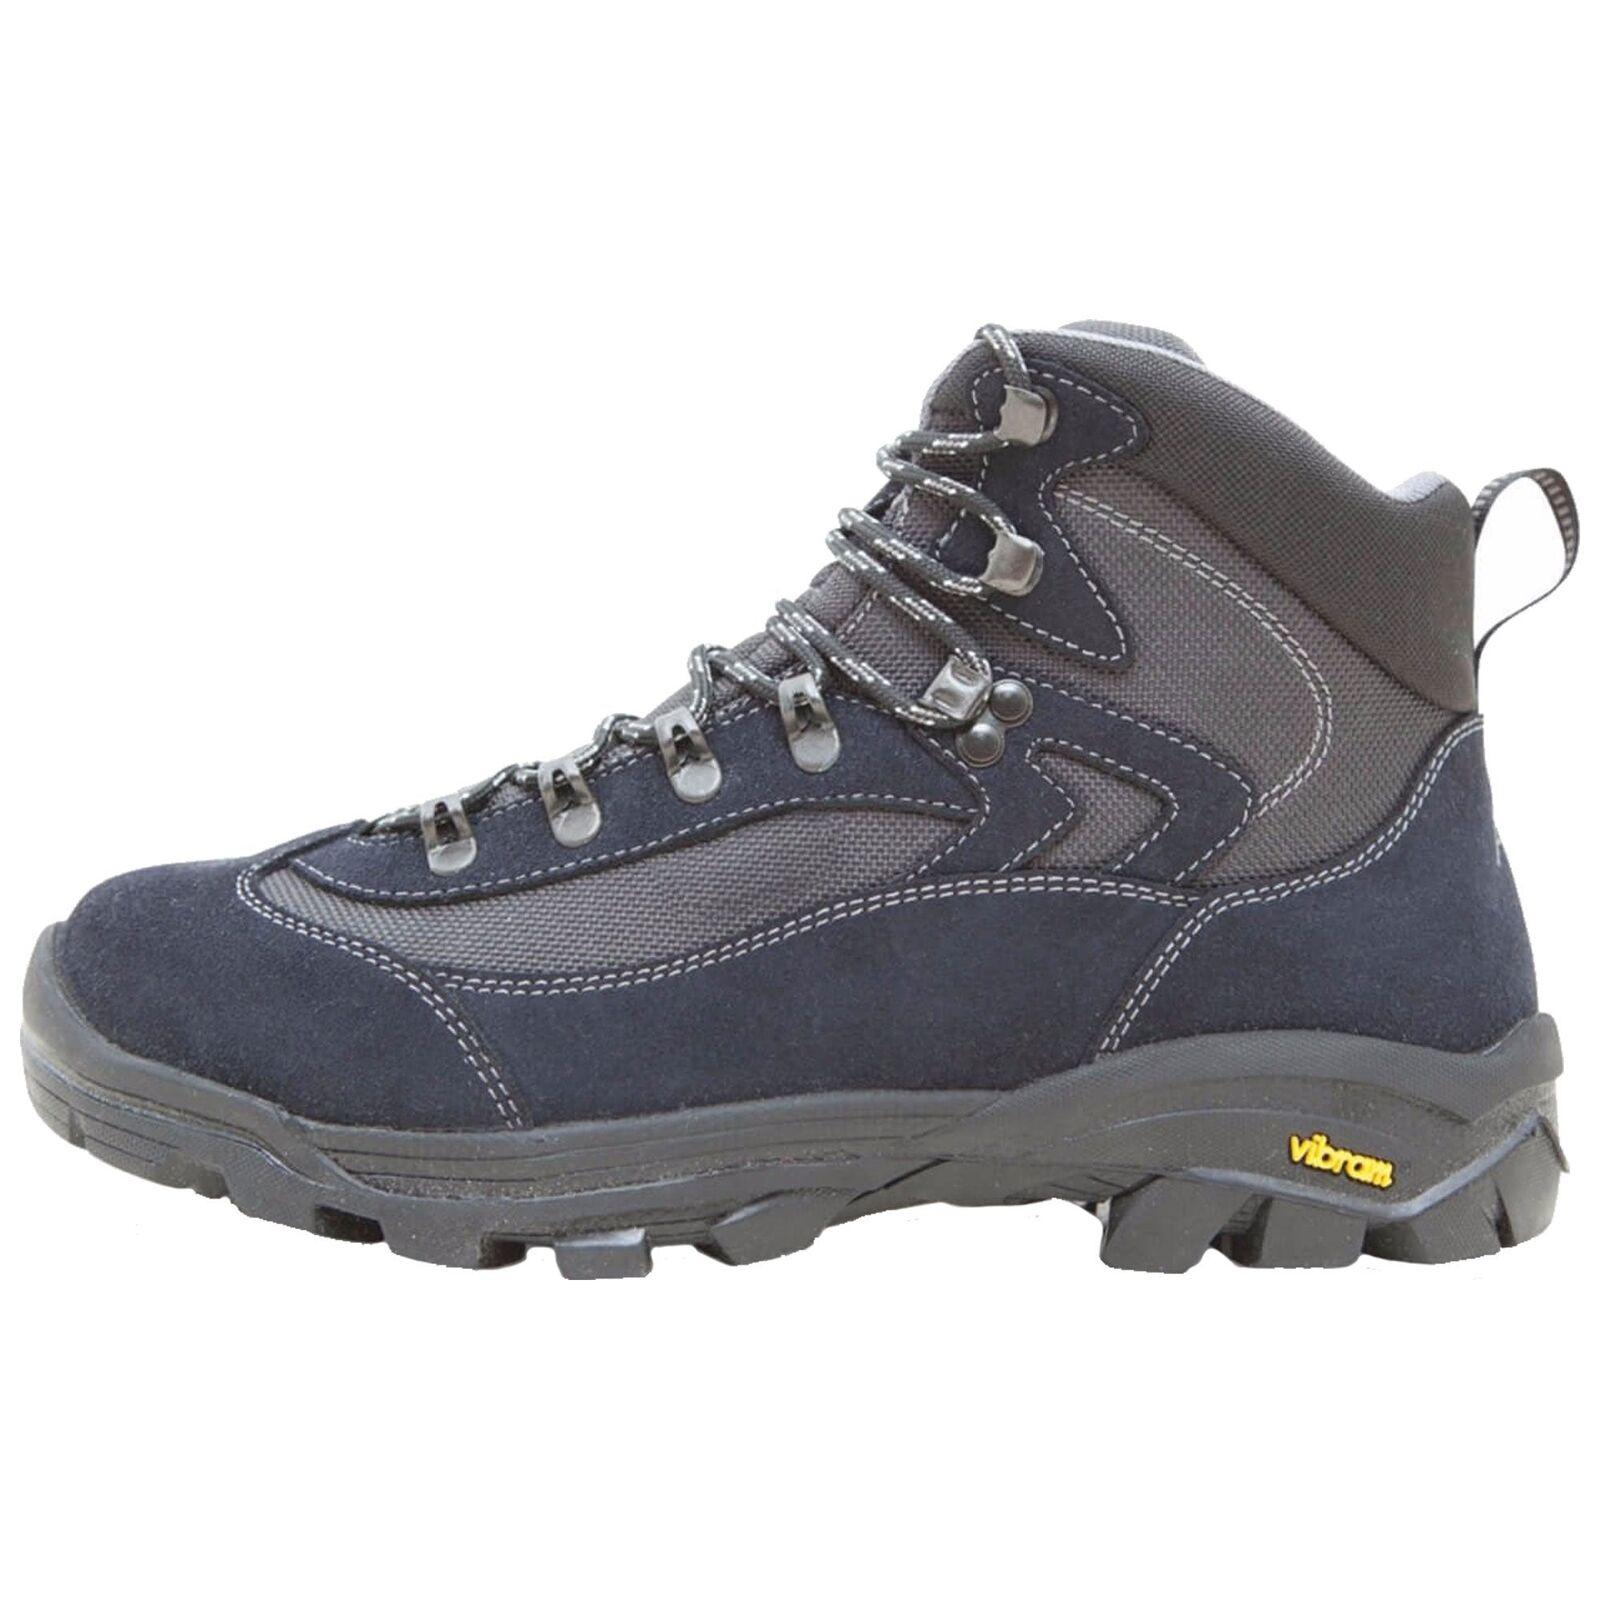 Anatom Mens V2 Vorlich Walking/Hiking Boots (Euro Size 46/UK Size 11 only) £45.98 Delivered (Next Day Courier Service) @ Gaynor Sports